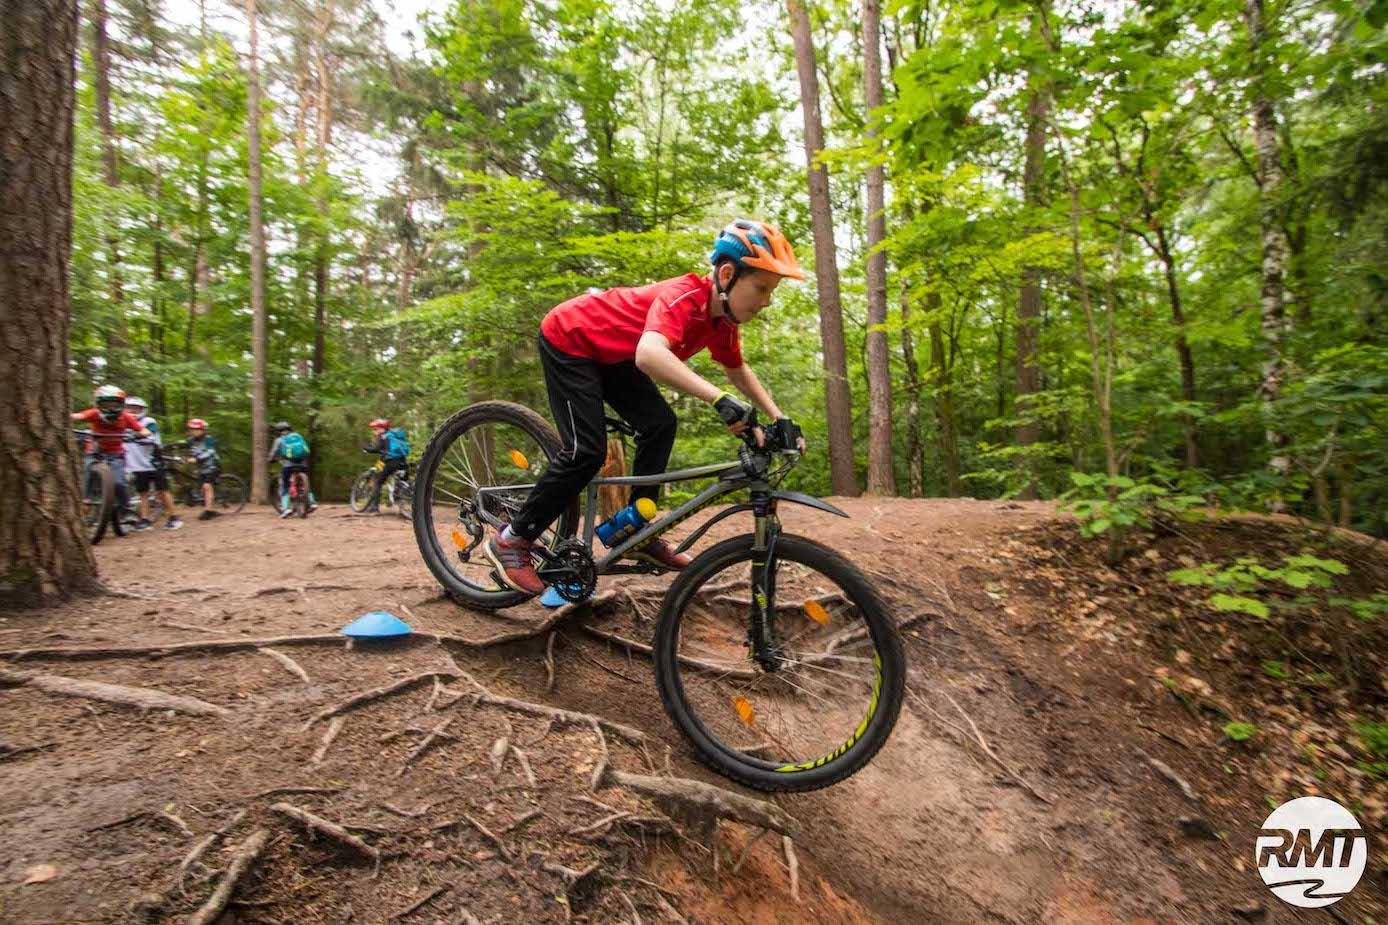 Mountainbike Kinder Kurs in Ravensburg - 8-12 Jahre Kids - Rock my Trail Fahrtechnik Bikeschule